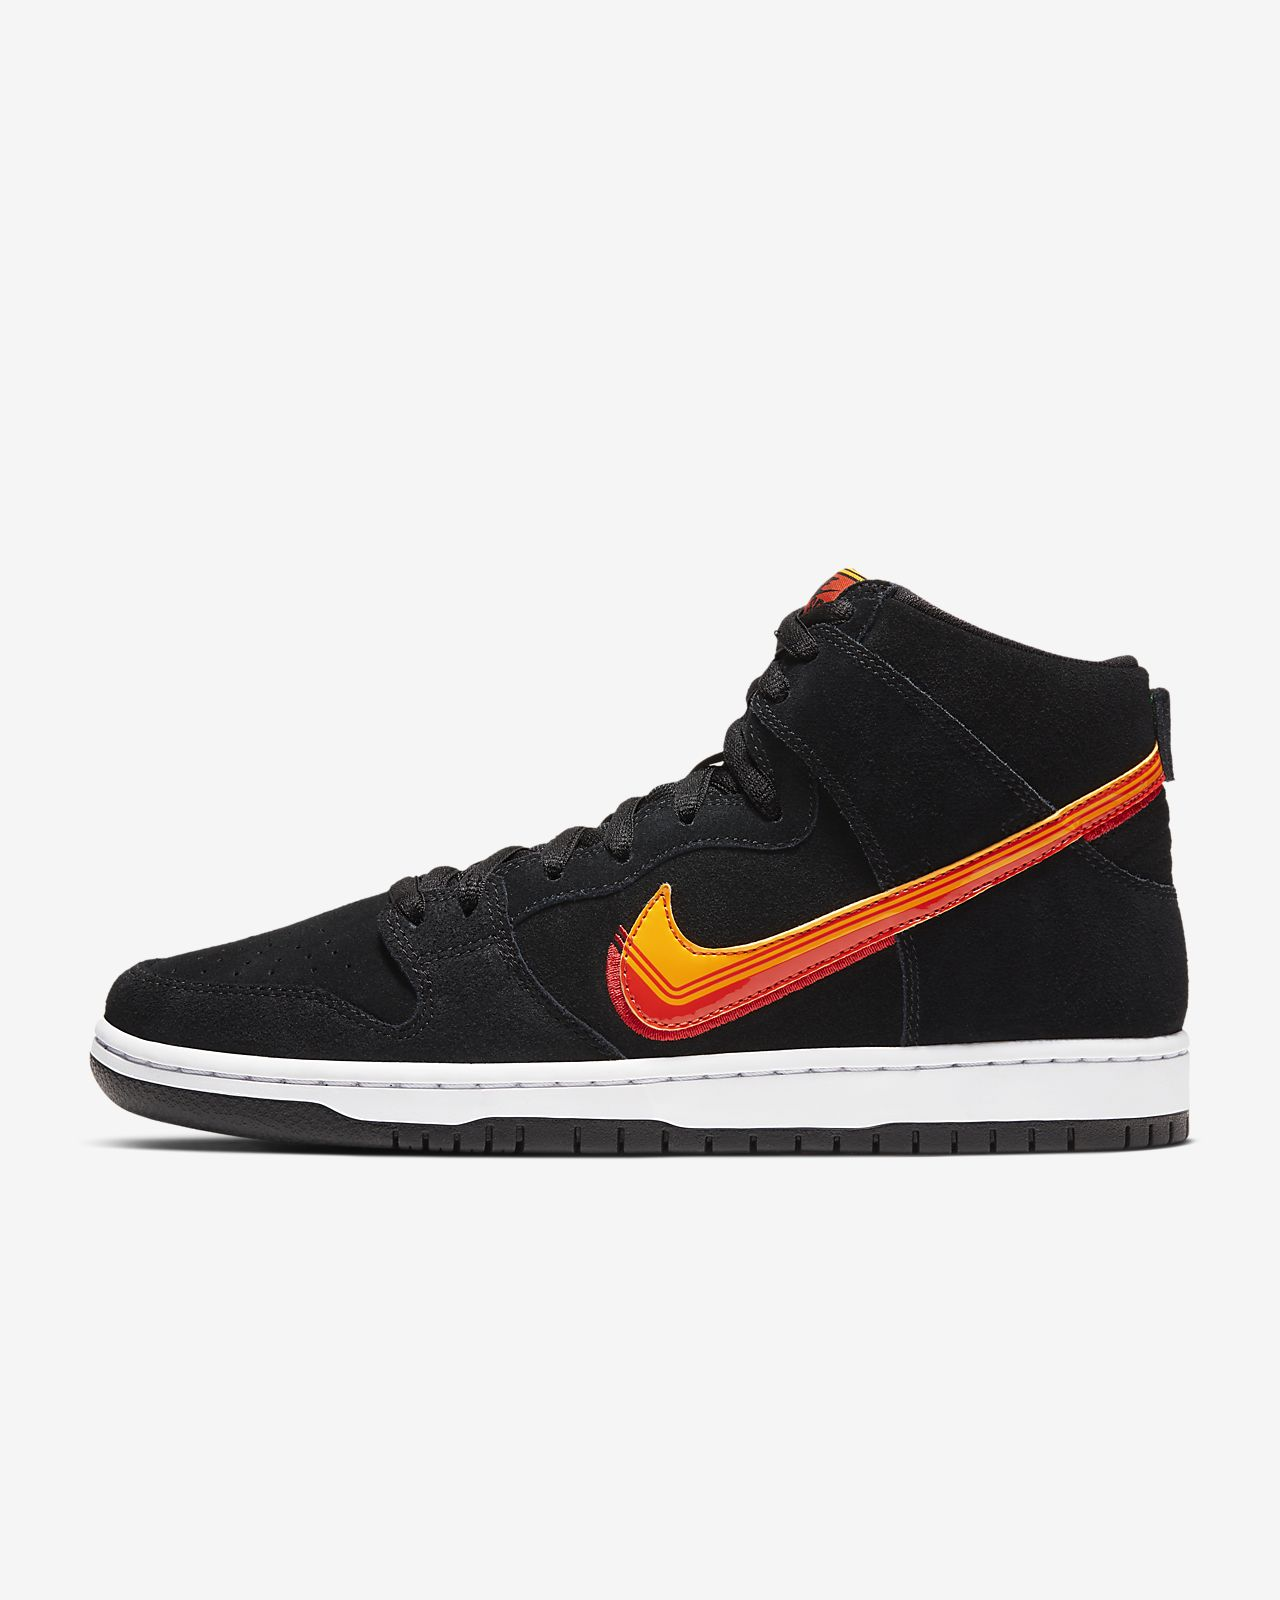 Nike Sb Sko : Køb Nike Sneakers & Basketball Sko & Fodbold